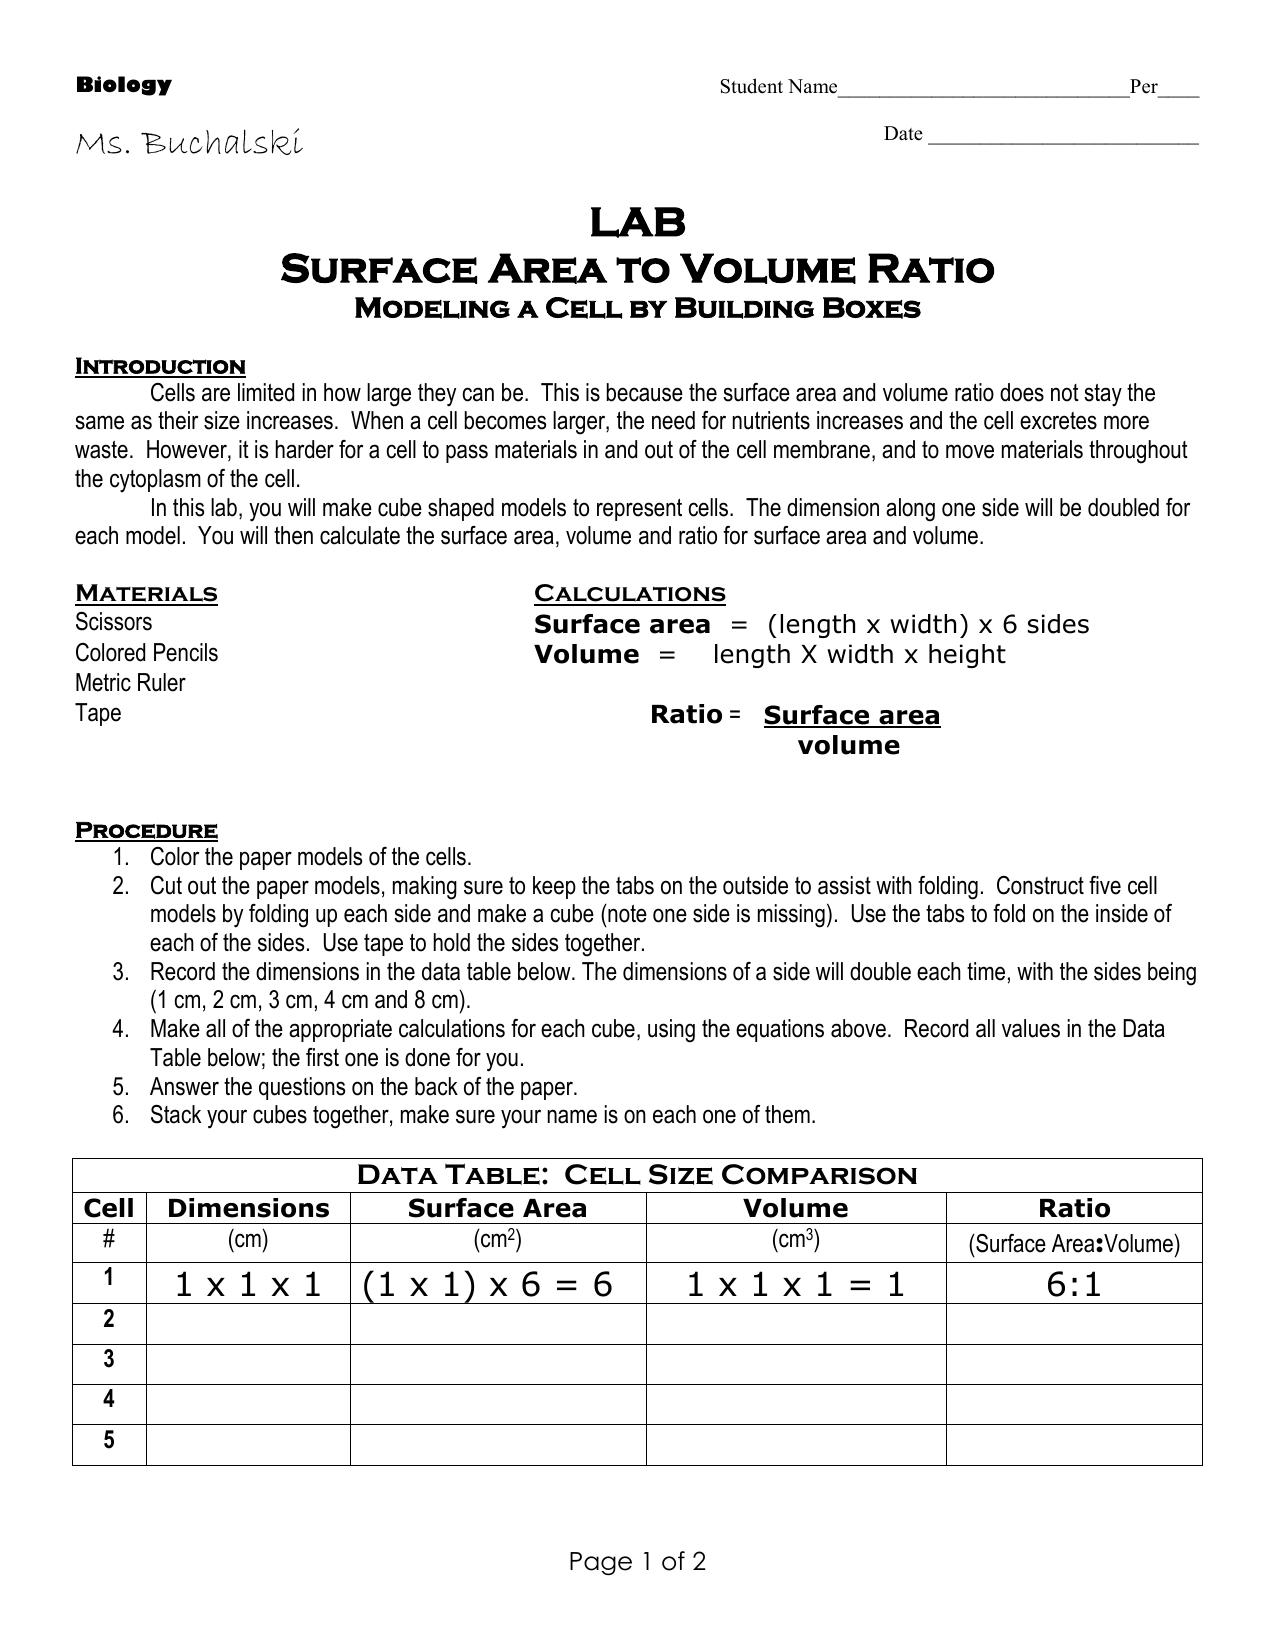 worksheet Ratio Table Worksheet workbooks ratio table worksheets free printable for surface area to volume worksheet stinksnthings